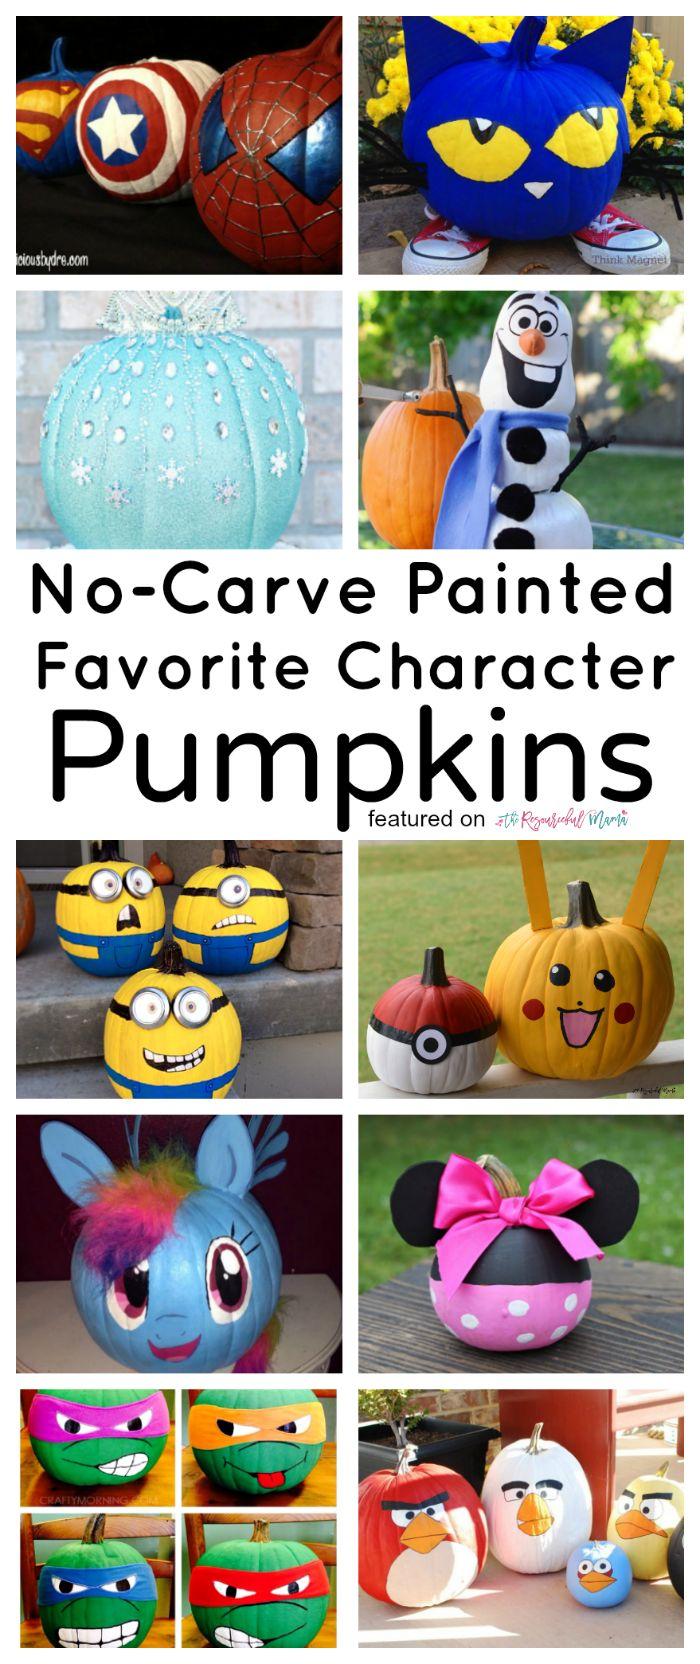 10 no carve painted favorite character pumpkins